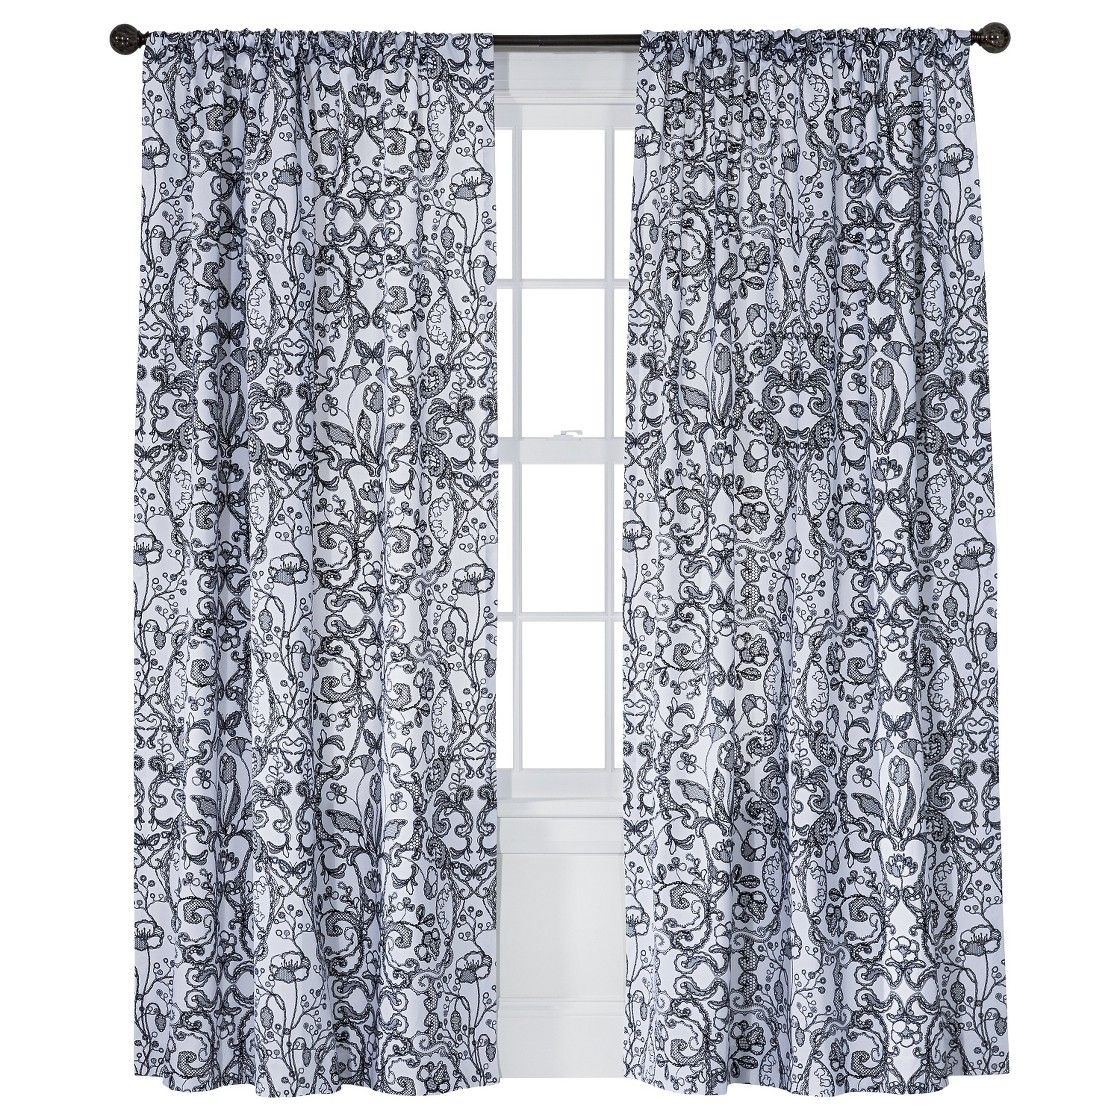 Xhilaration Lace Curtain Panel Black 50x84 Lace Window